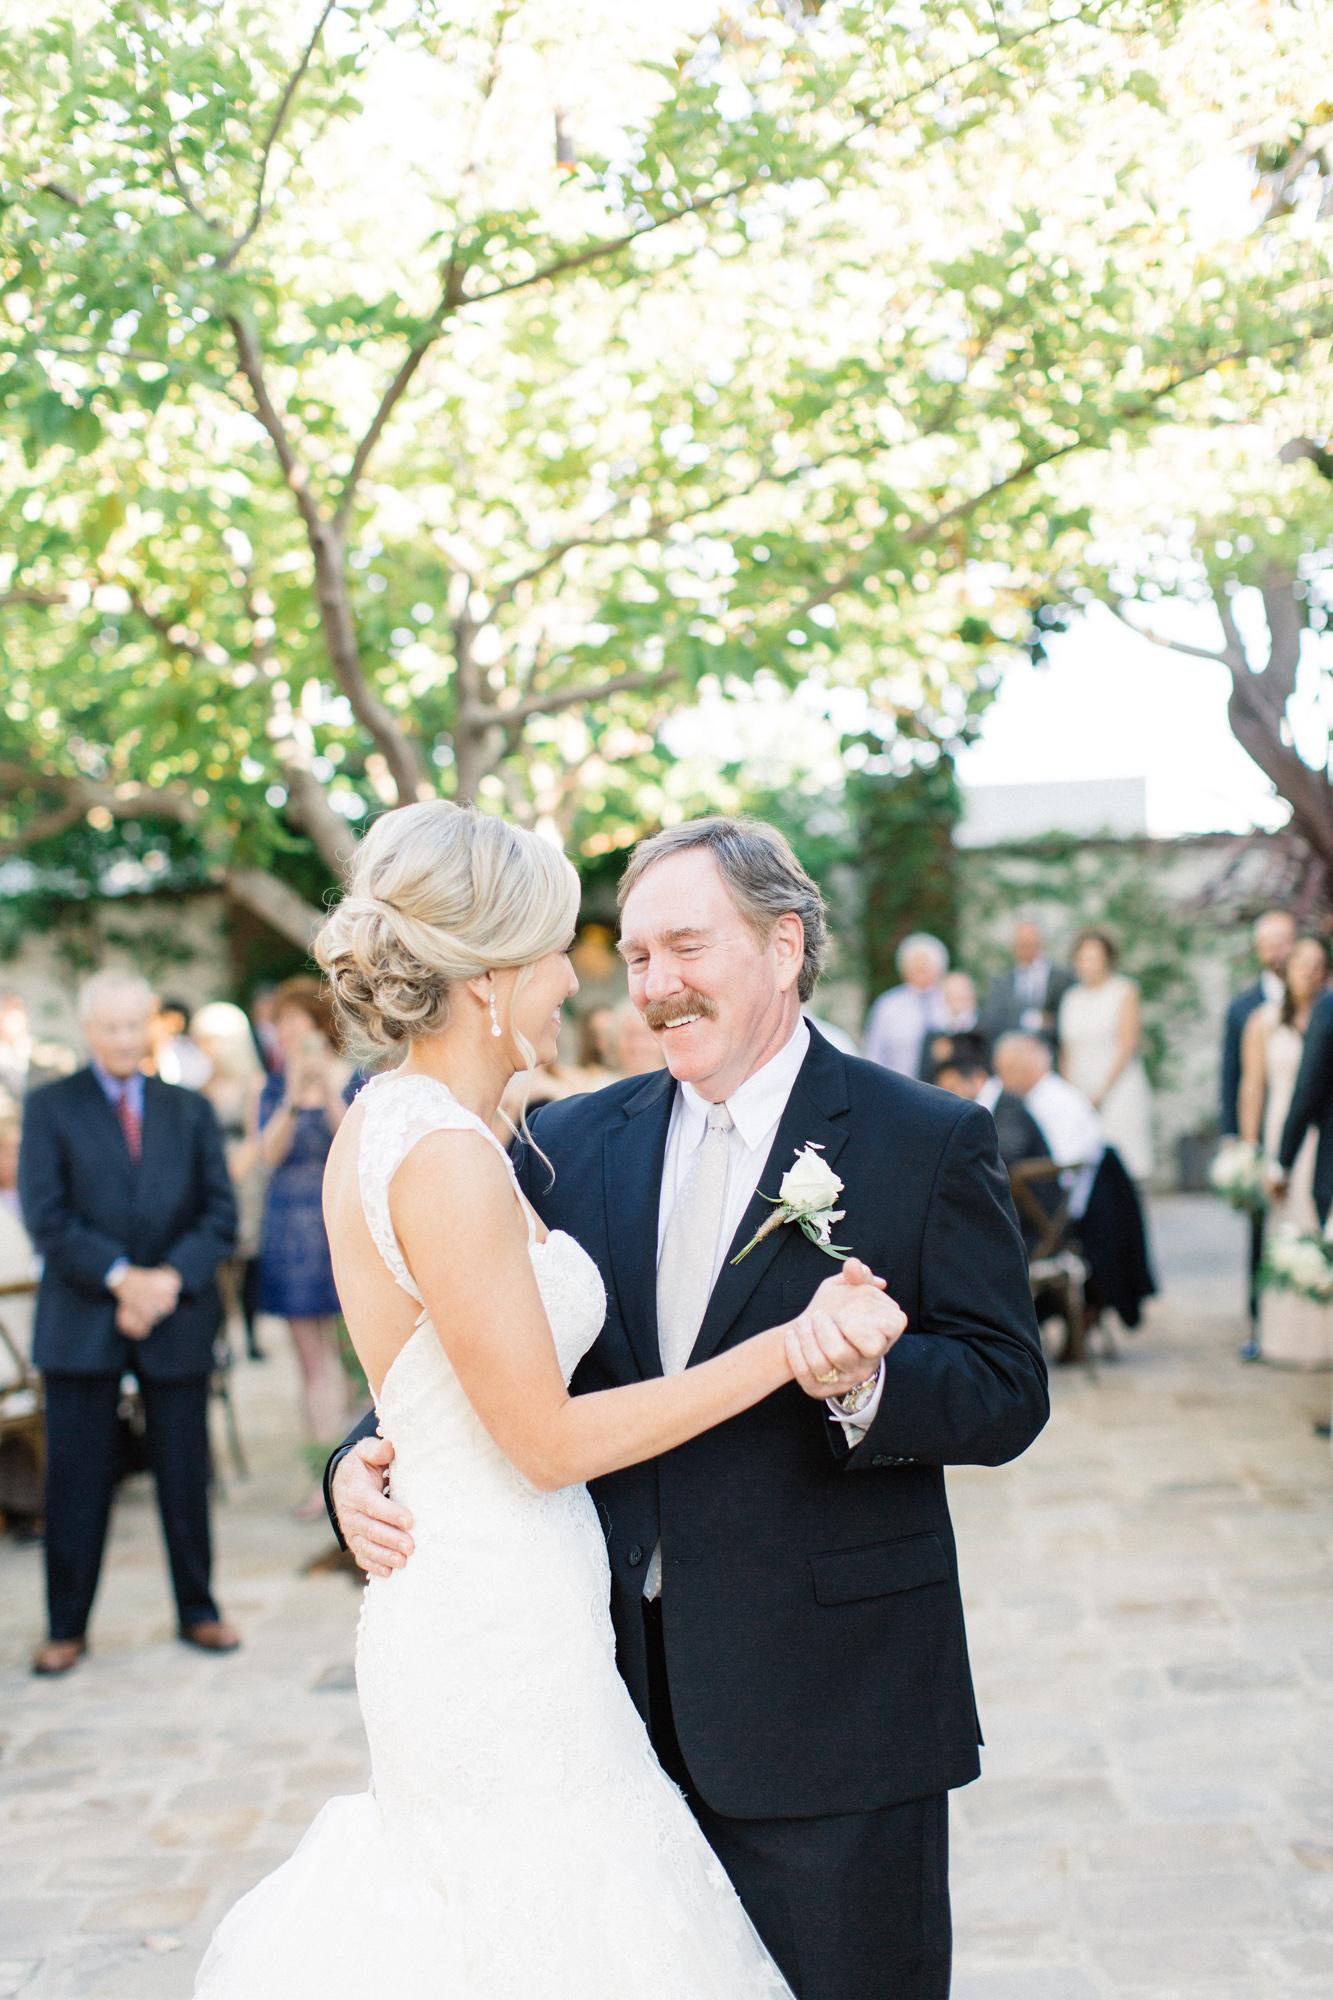 Villa-San-Juan-Capistrano-Wedding-Kristina-Adams-57.jpg